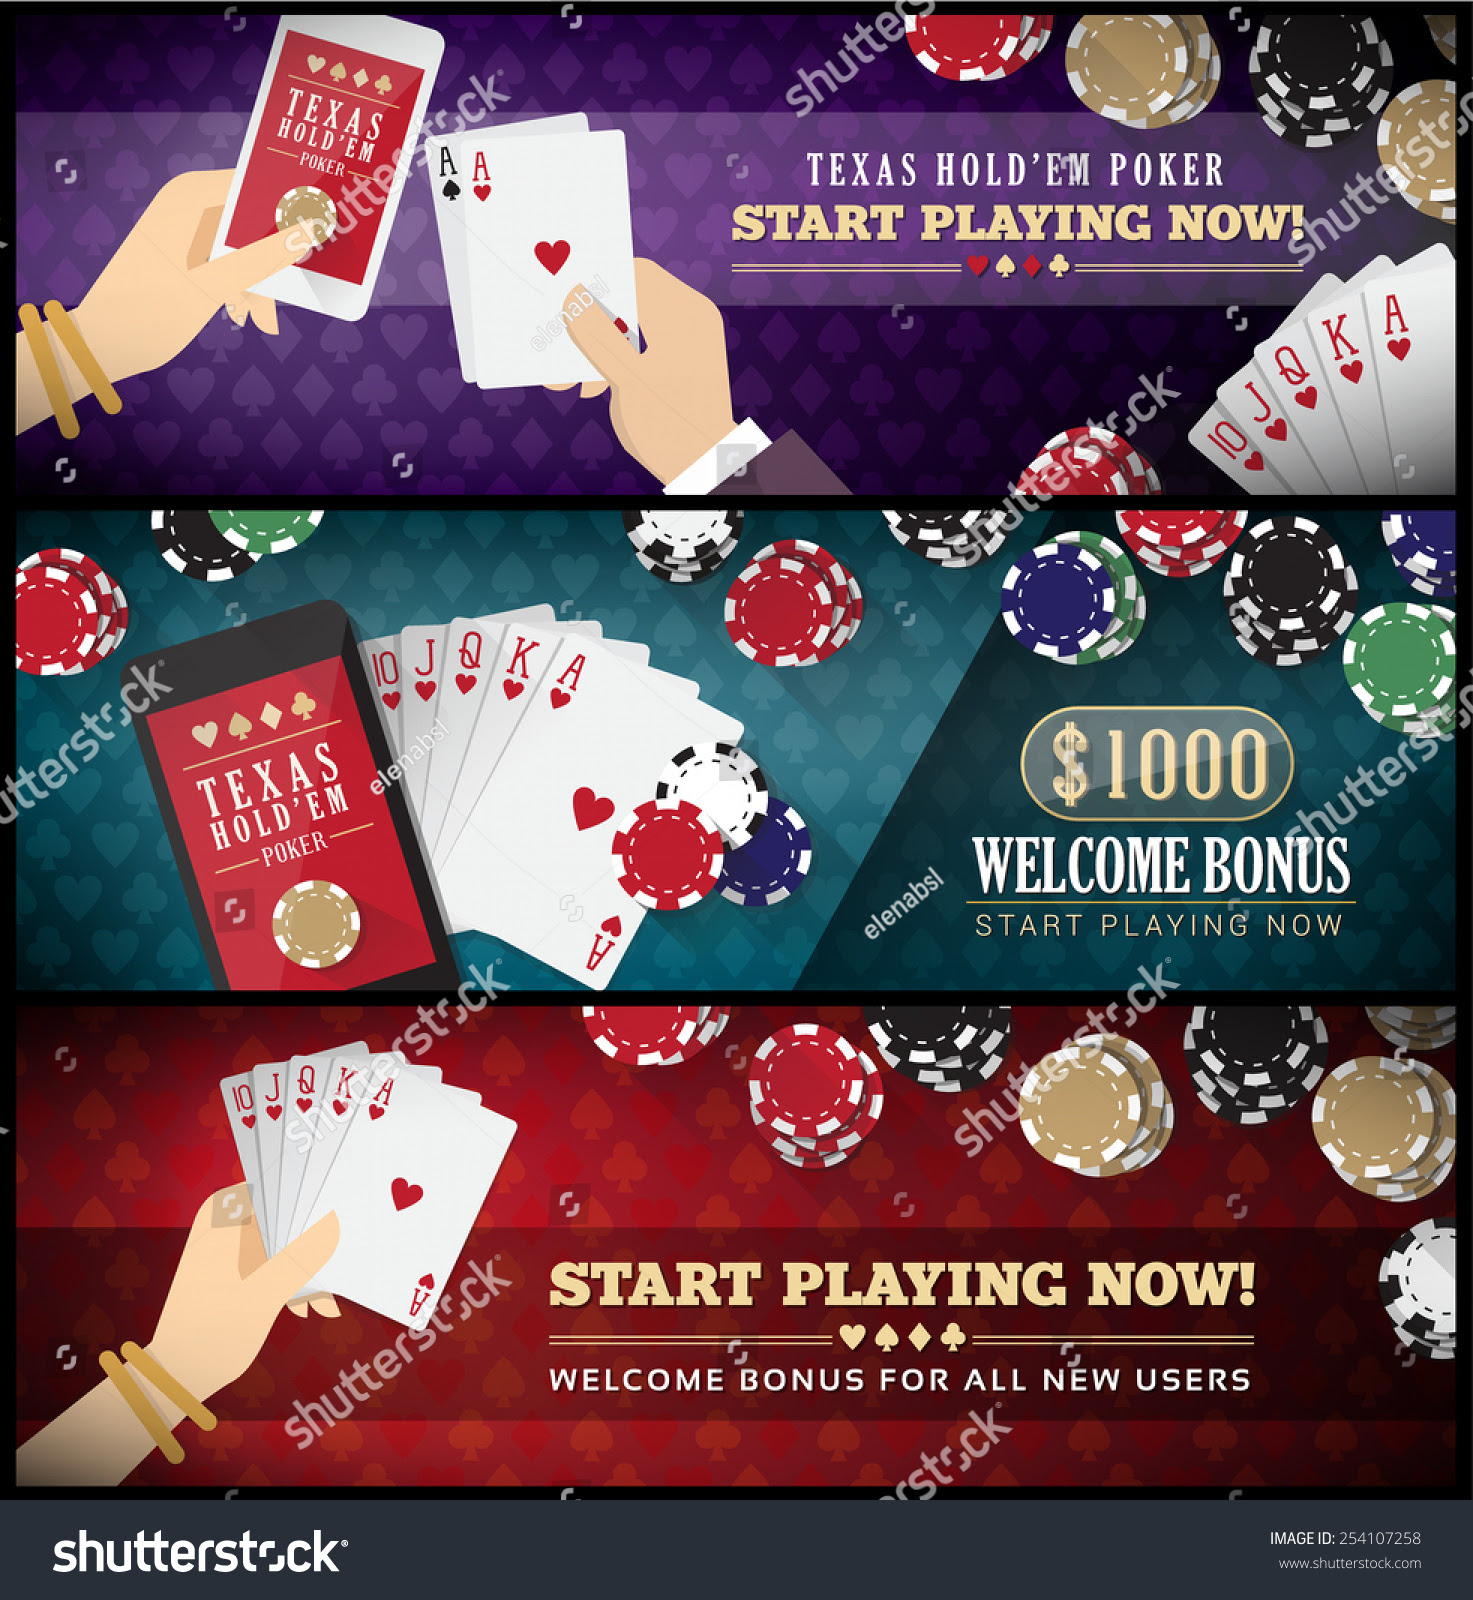 Vermont: casinos, online gambling, social gaming and gambling law